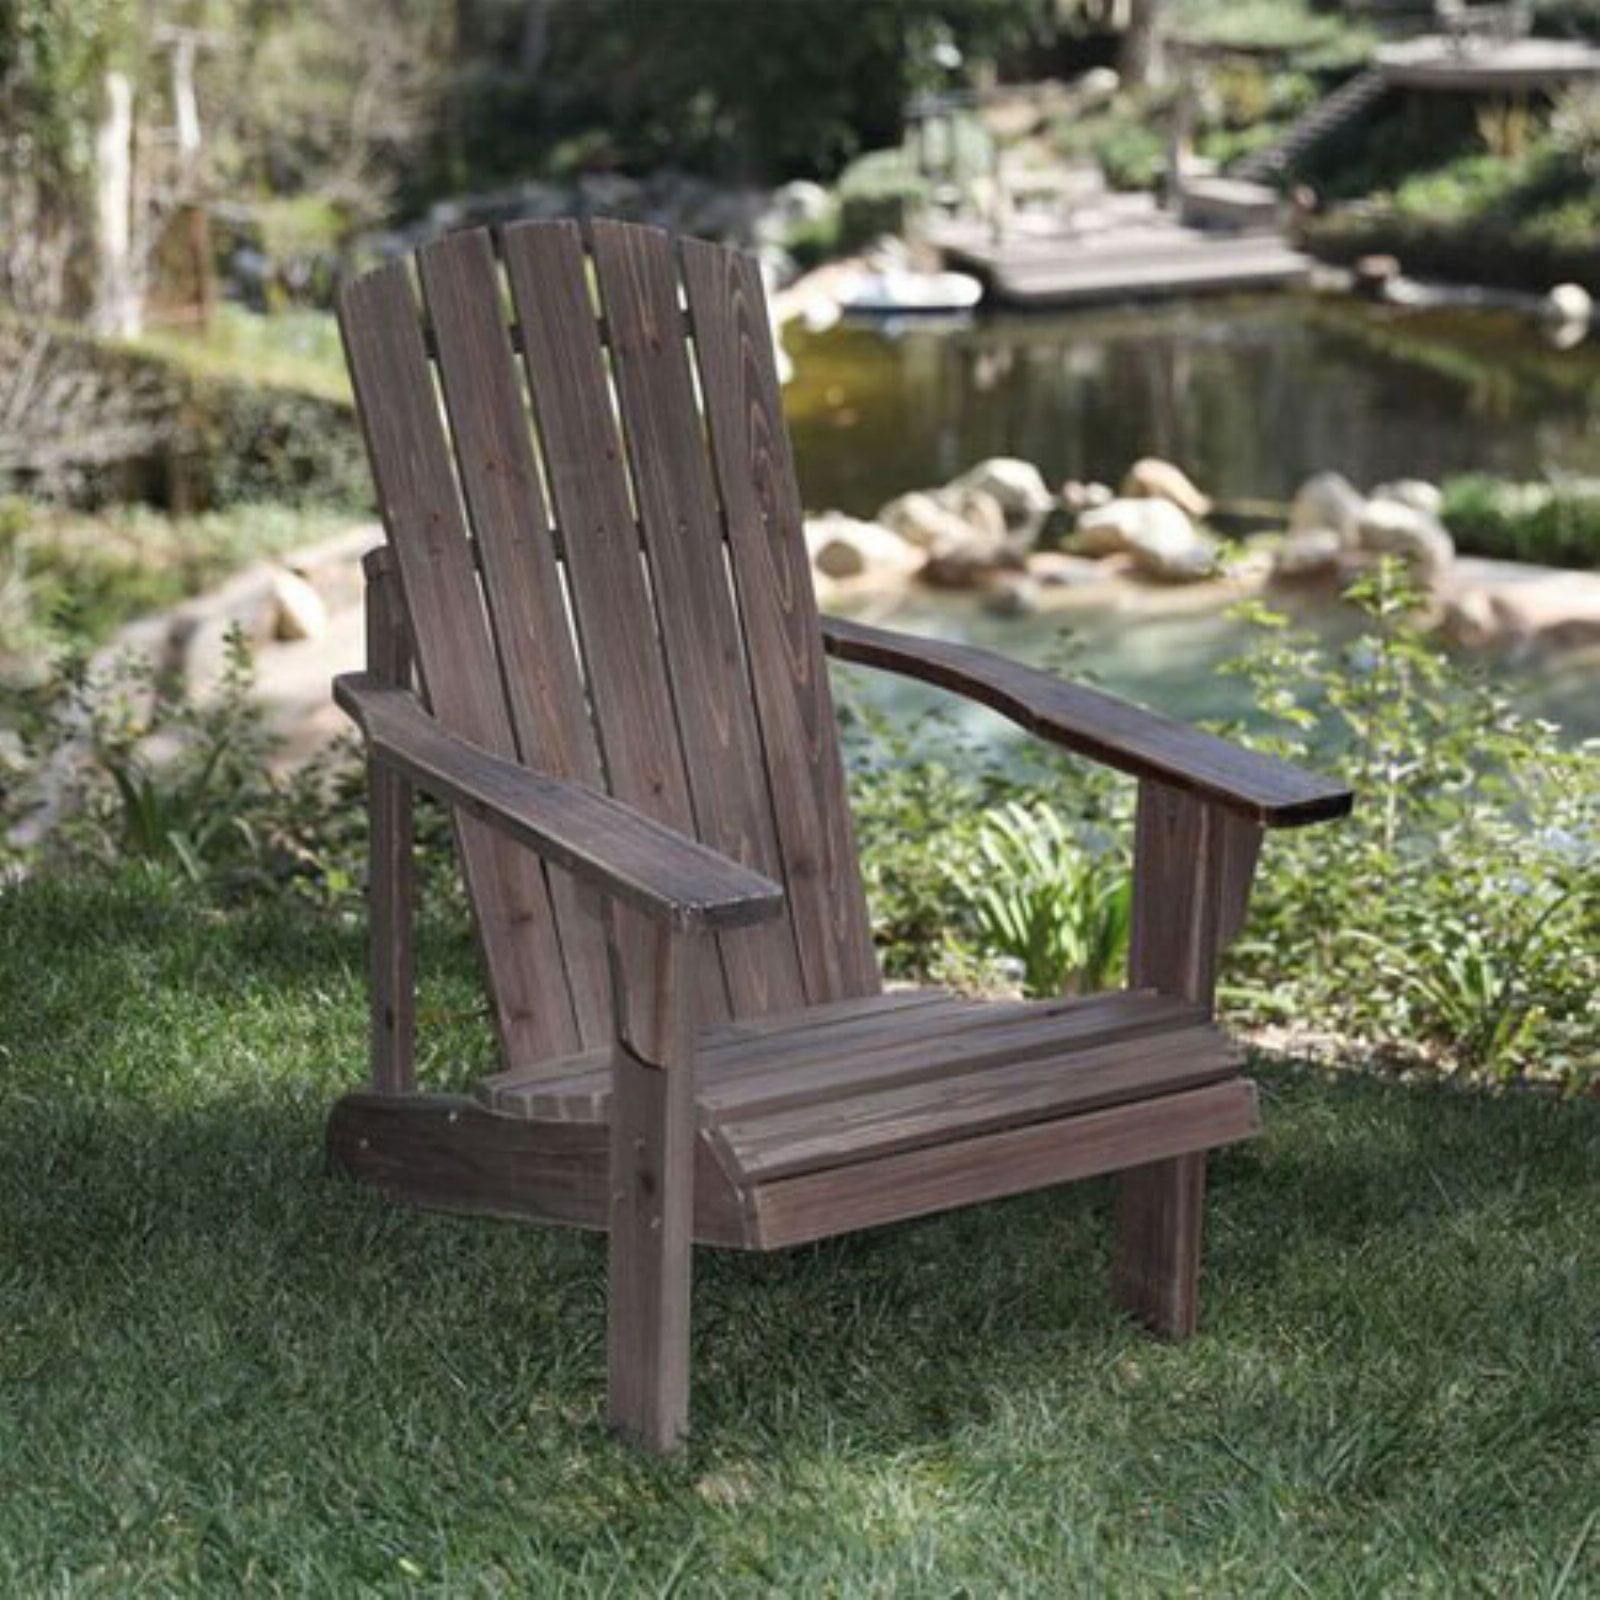 Lakewood Rustic Adirondack Chair Rustic Wine by Shine Company